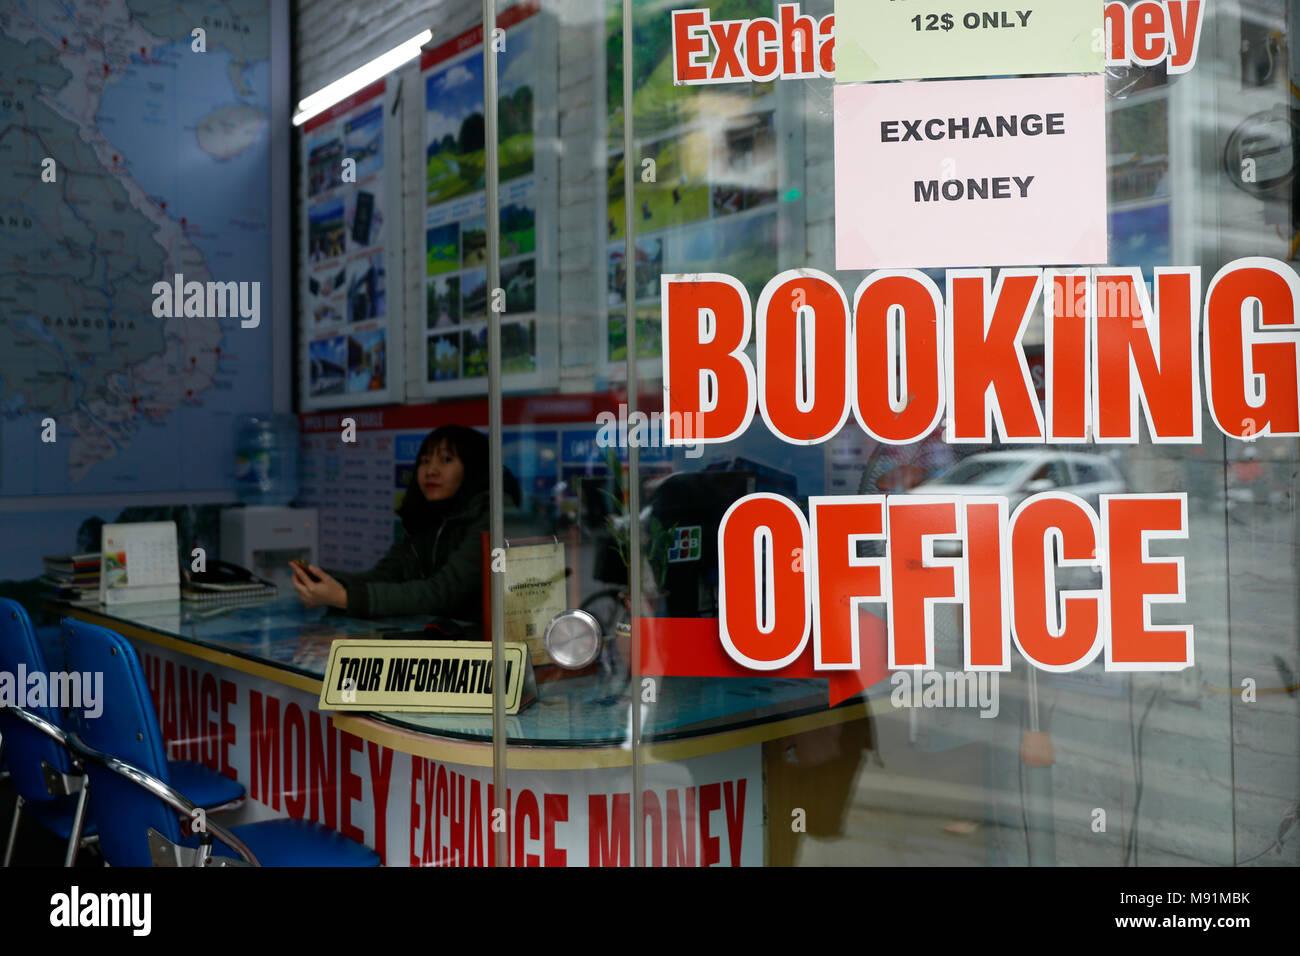 Reisebüro. Booking office. Hanoi. Vietnam. Stockbild